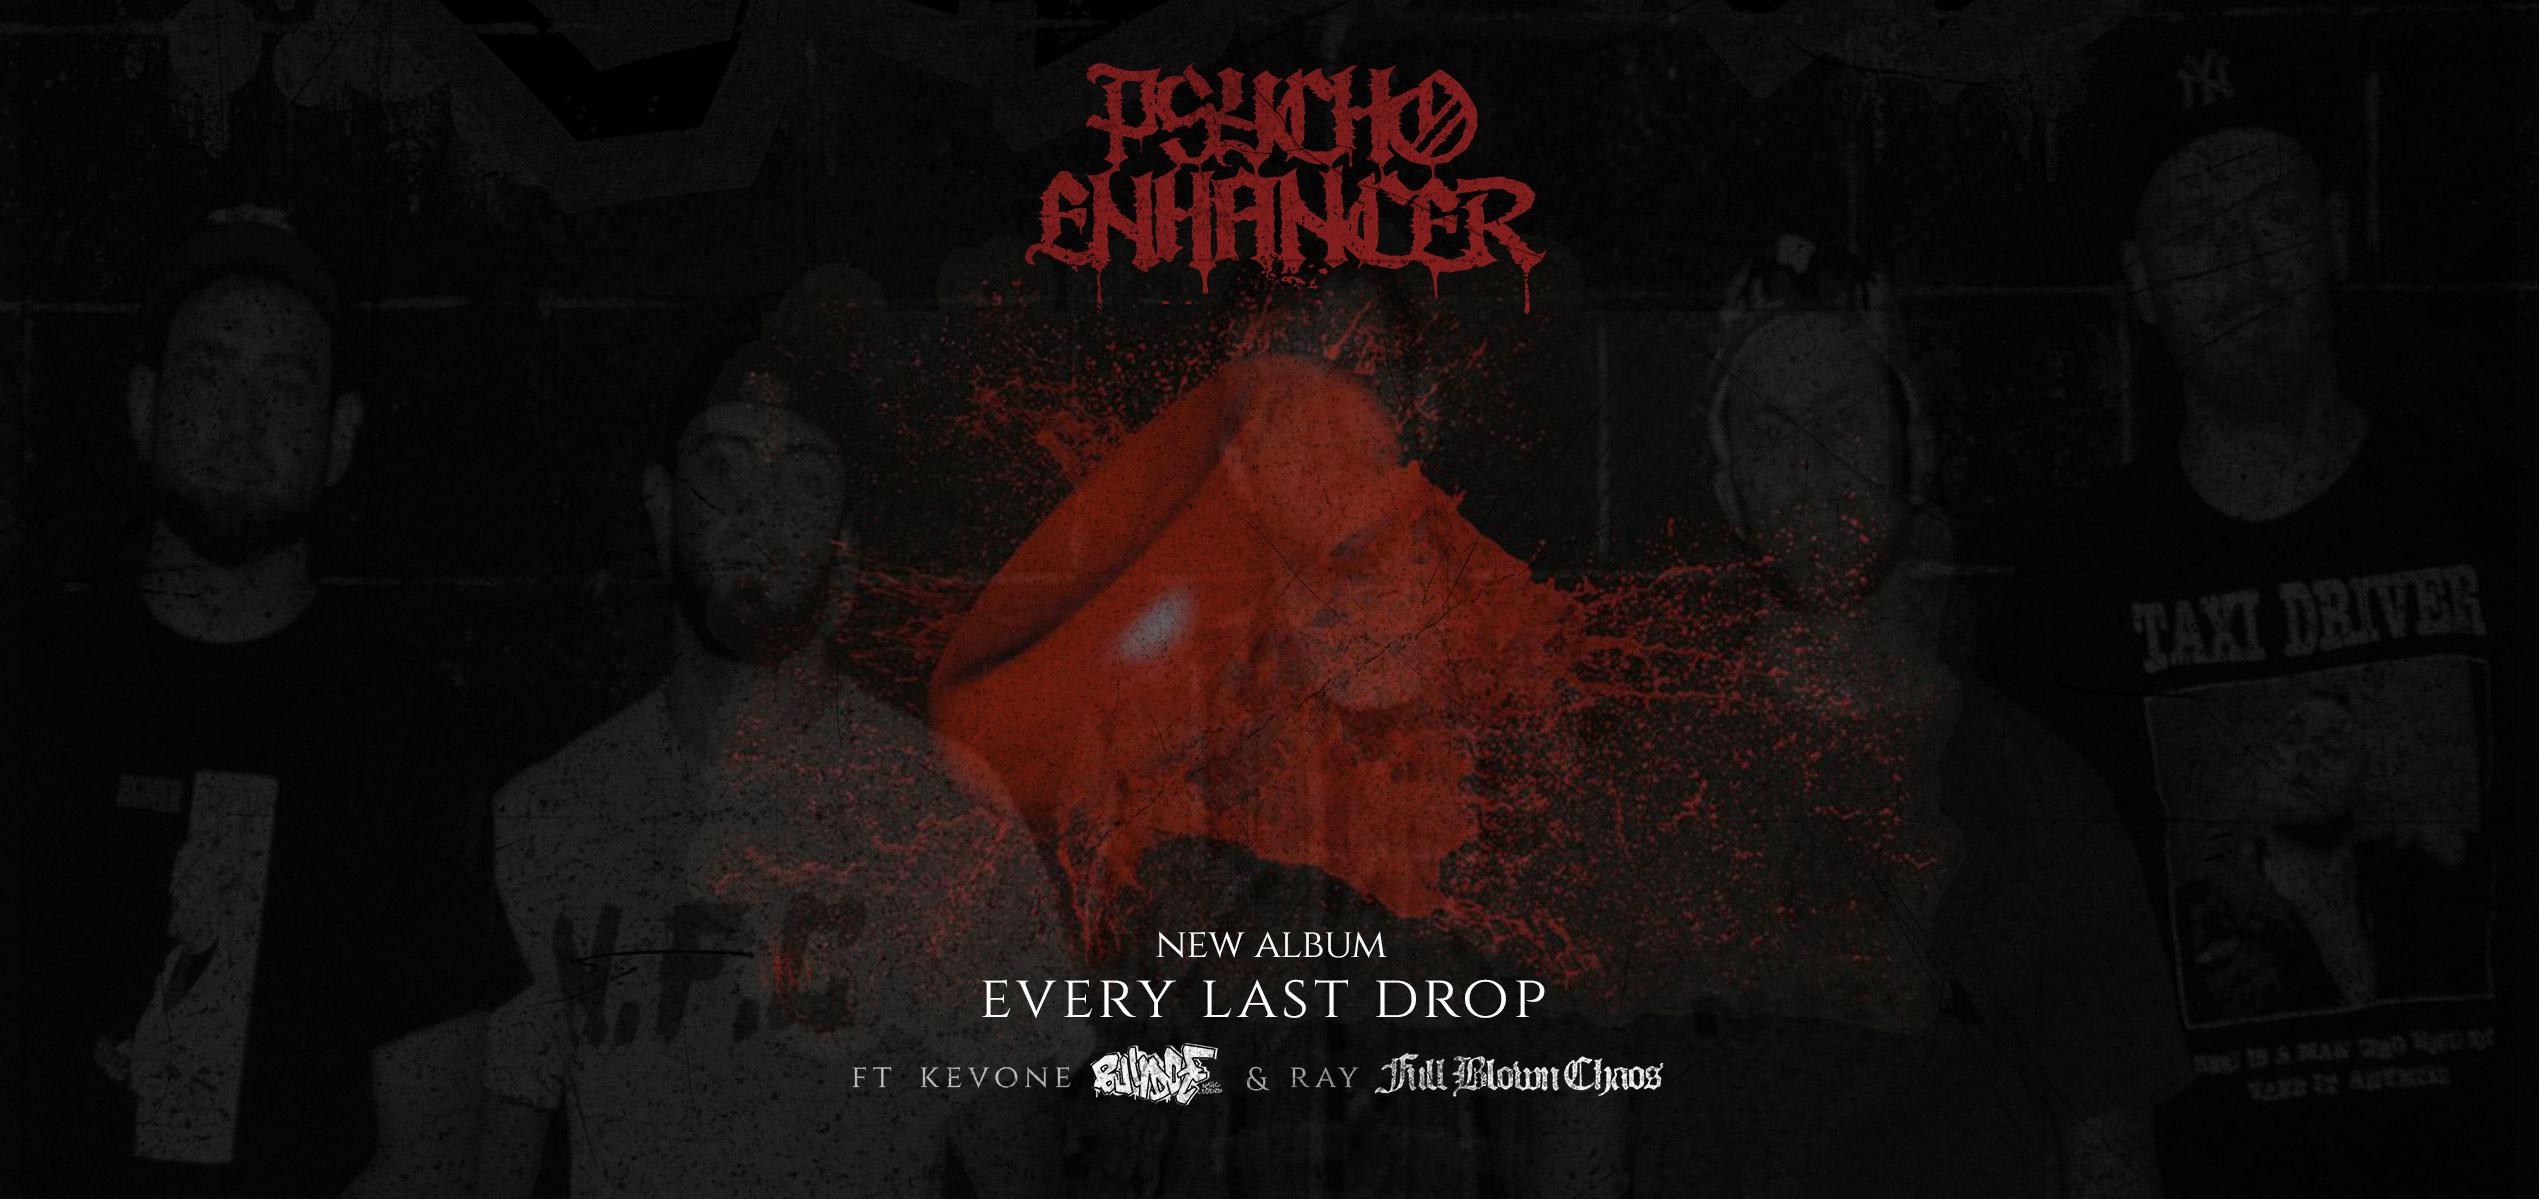 psycho-enhancer-everylastdrop-slide1